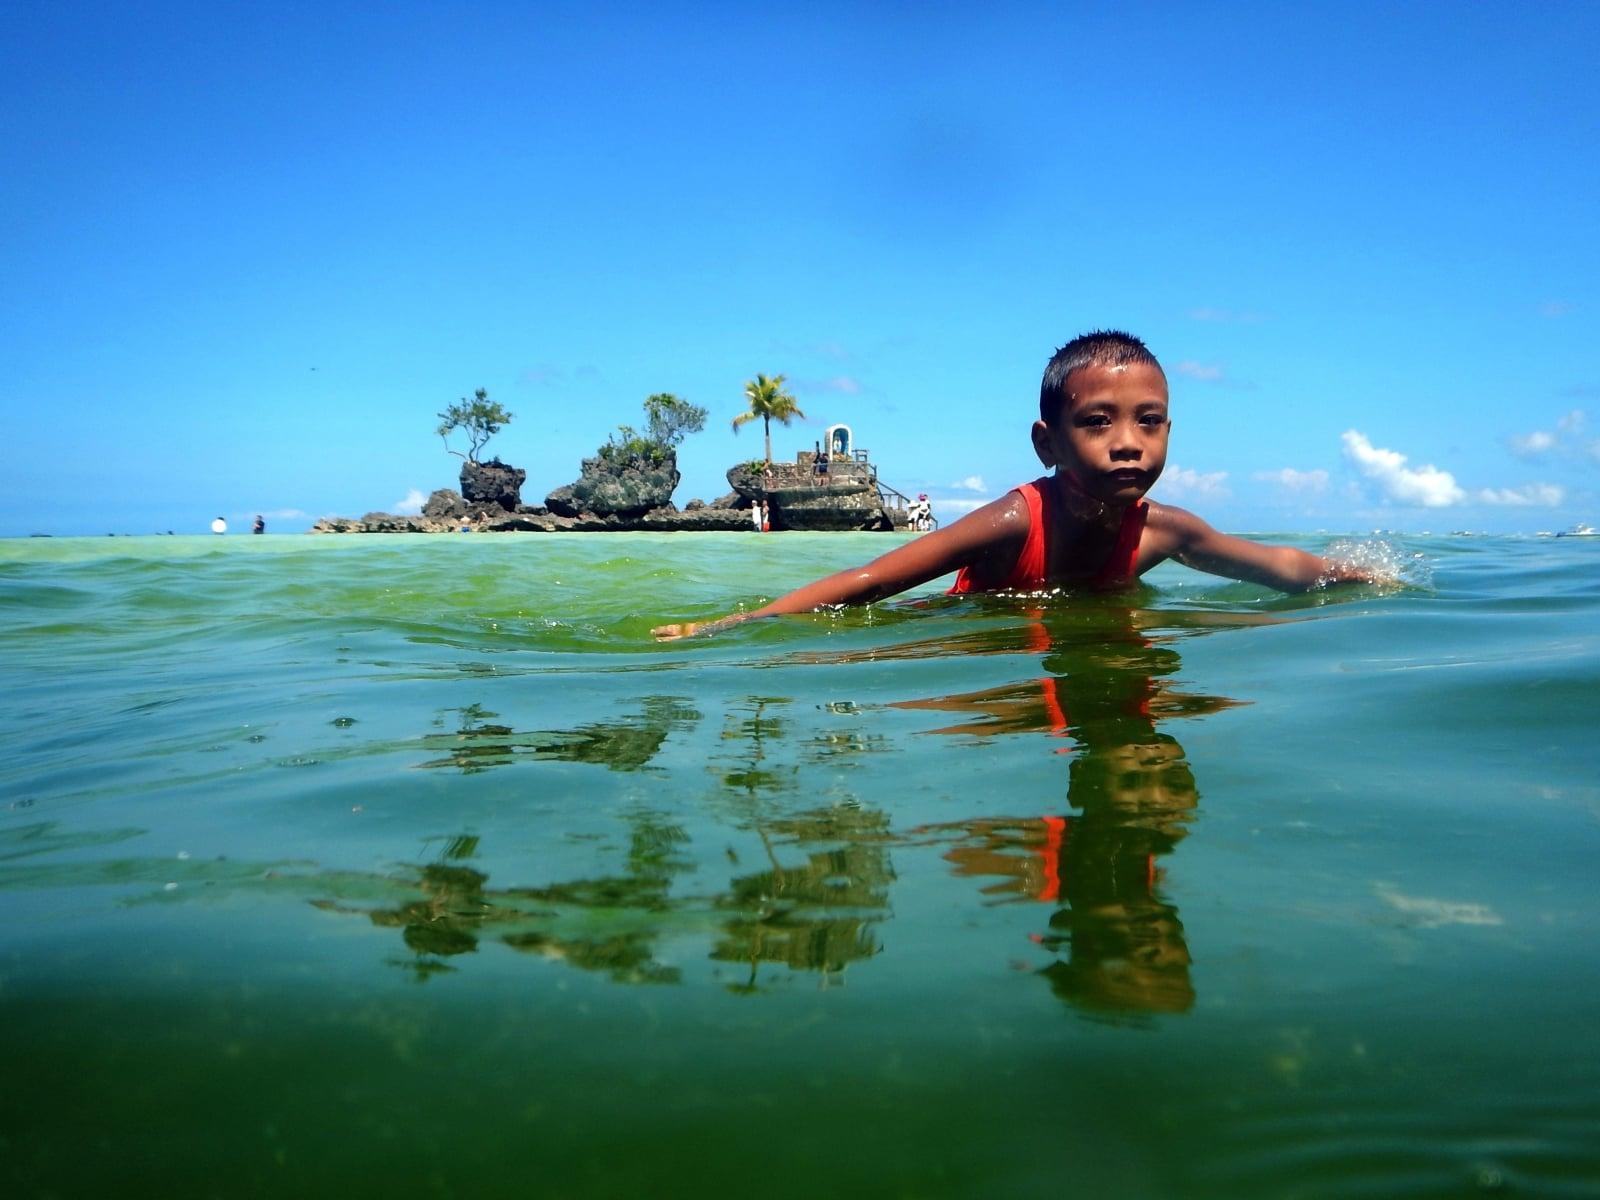 Filipiny fot. EPA/JO HARESH TANODRA